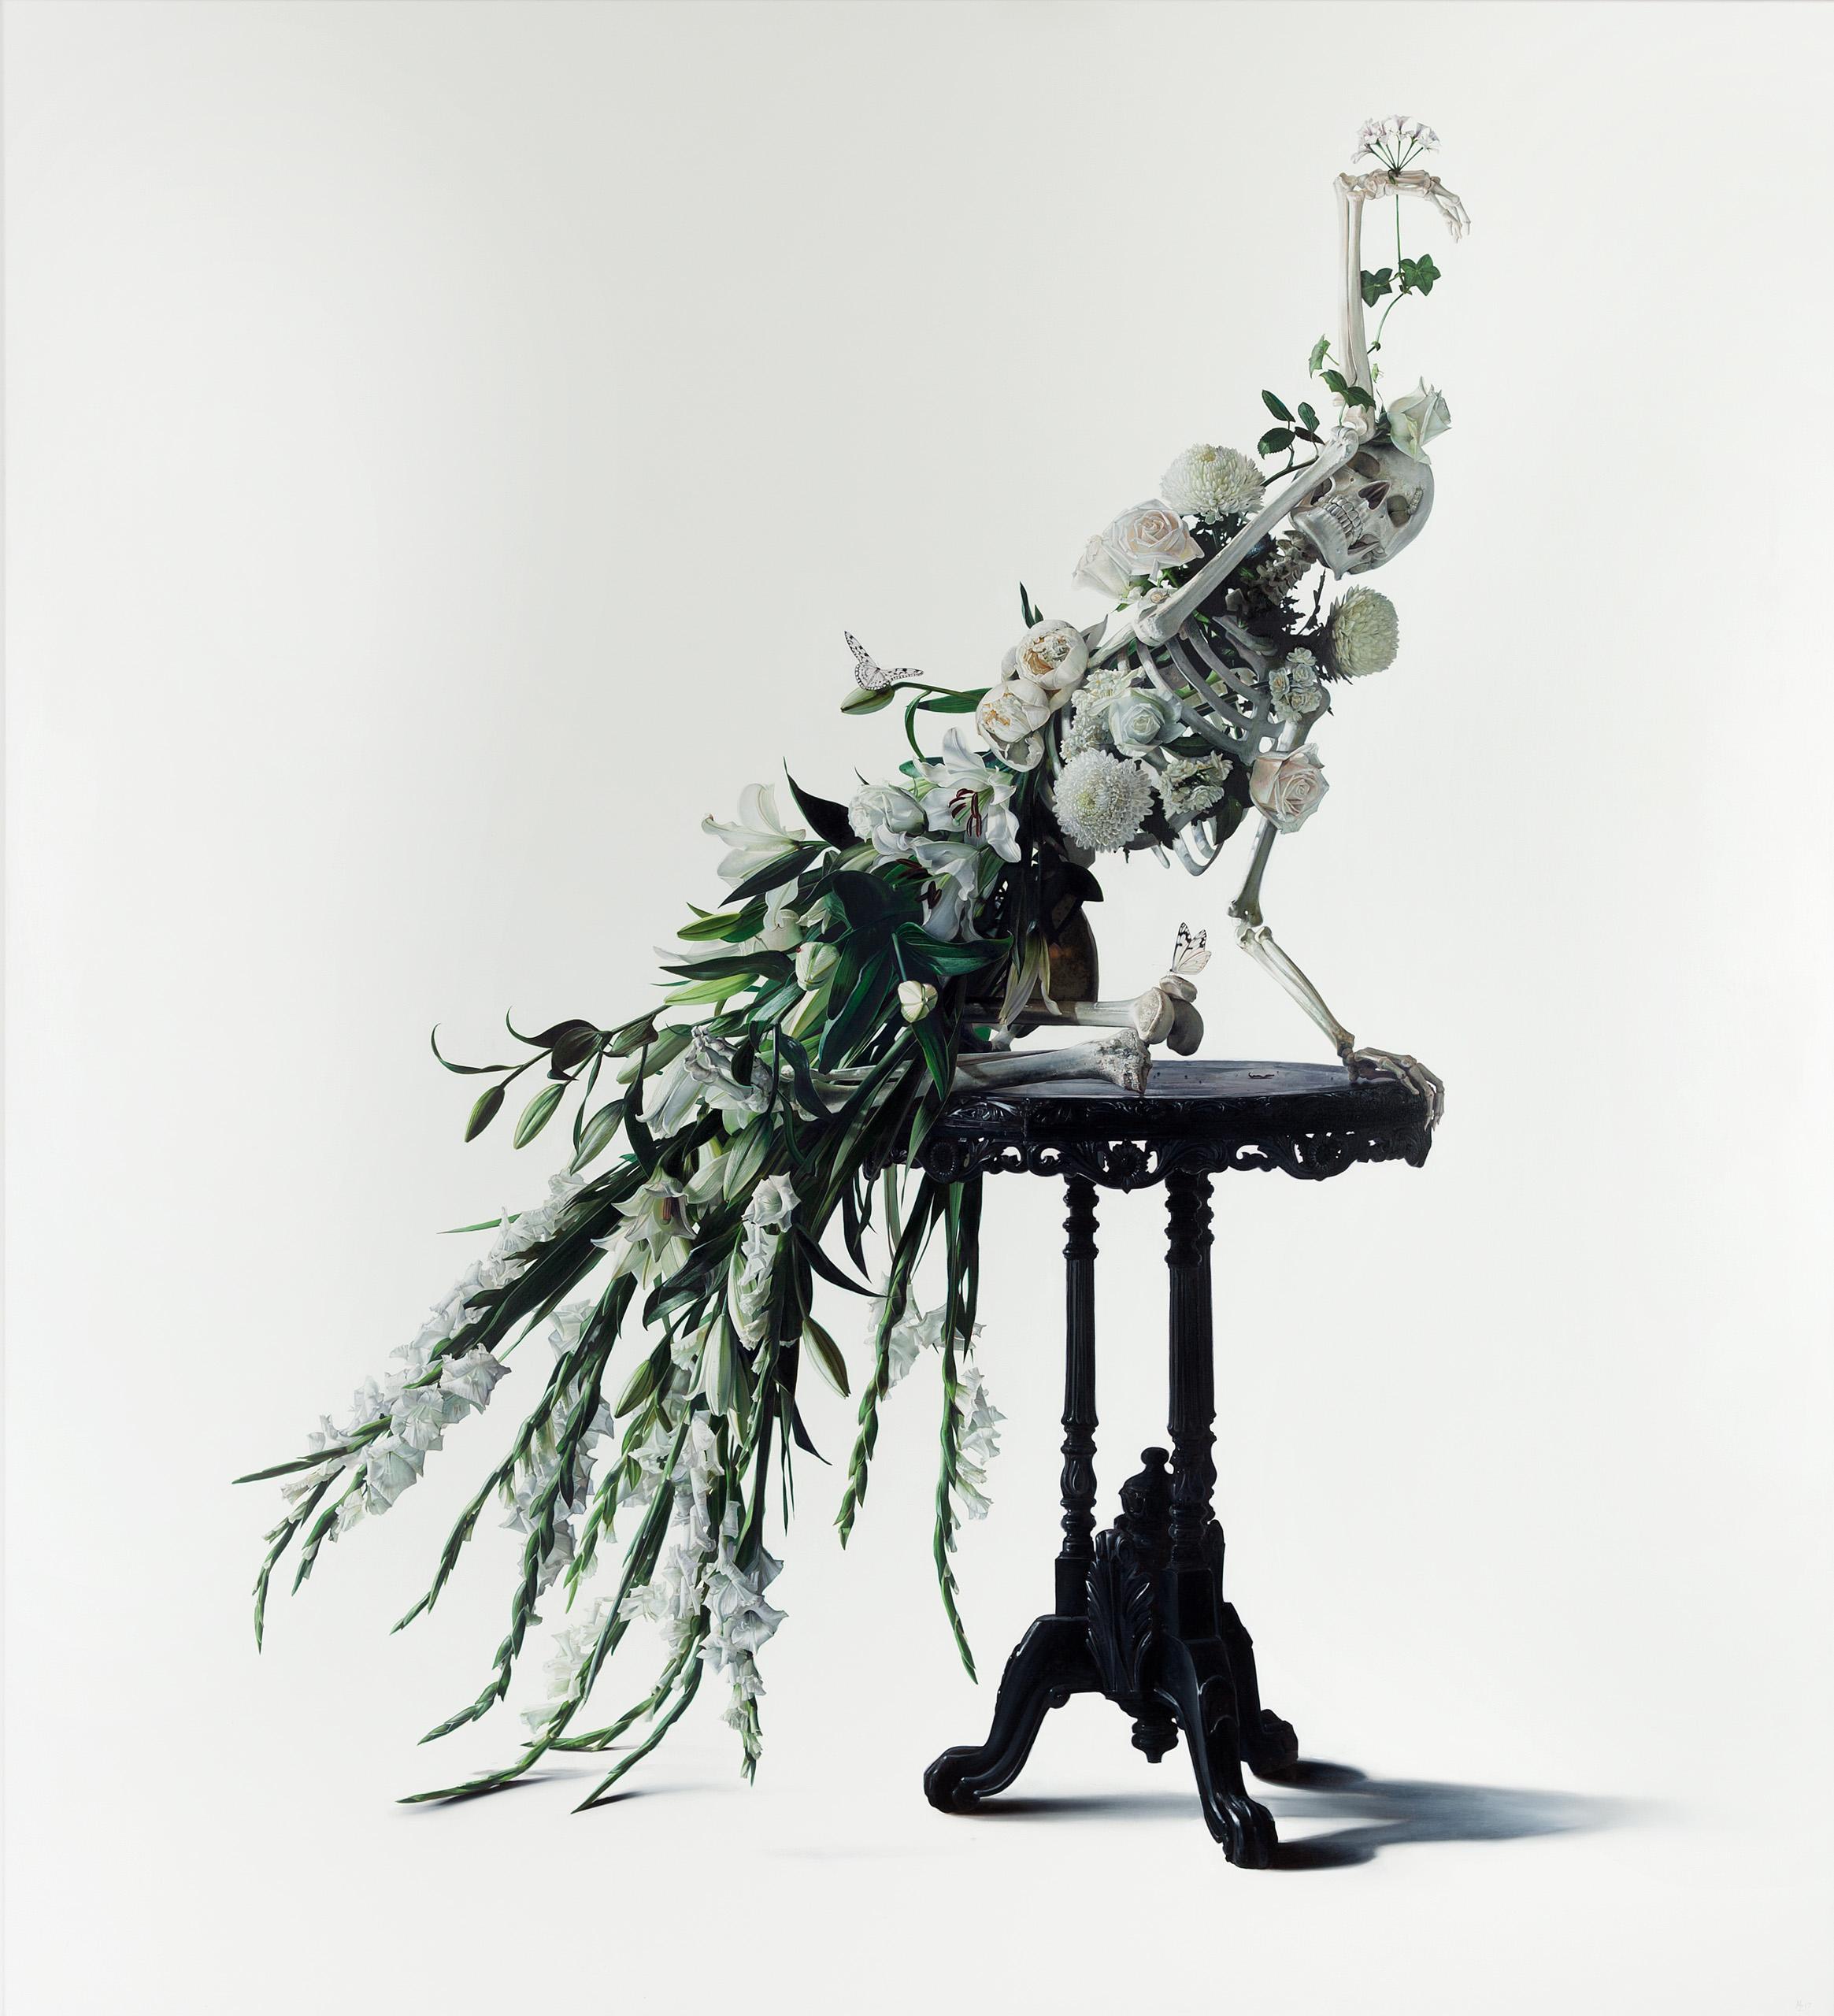 Michael Zavros,  White Peacock , 2017, oil on canvas, 2200 x 2000 mm